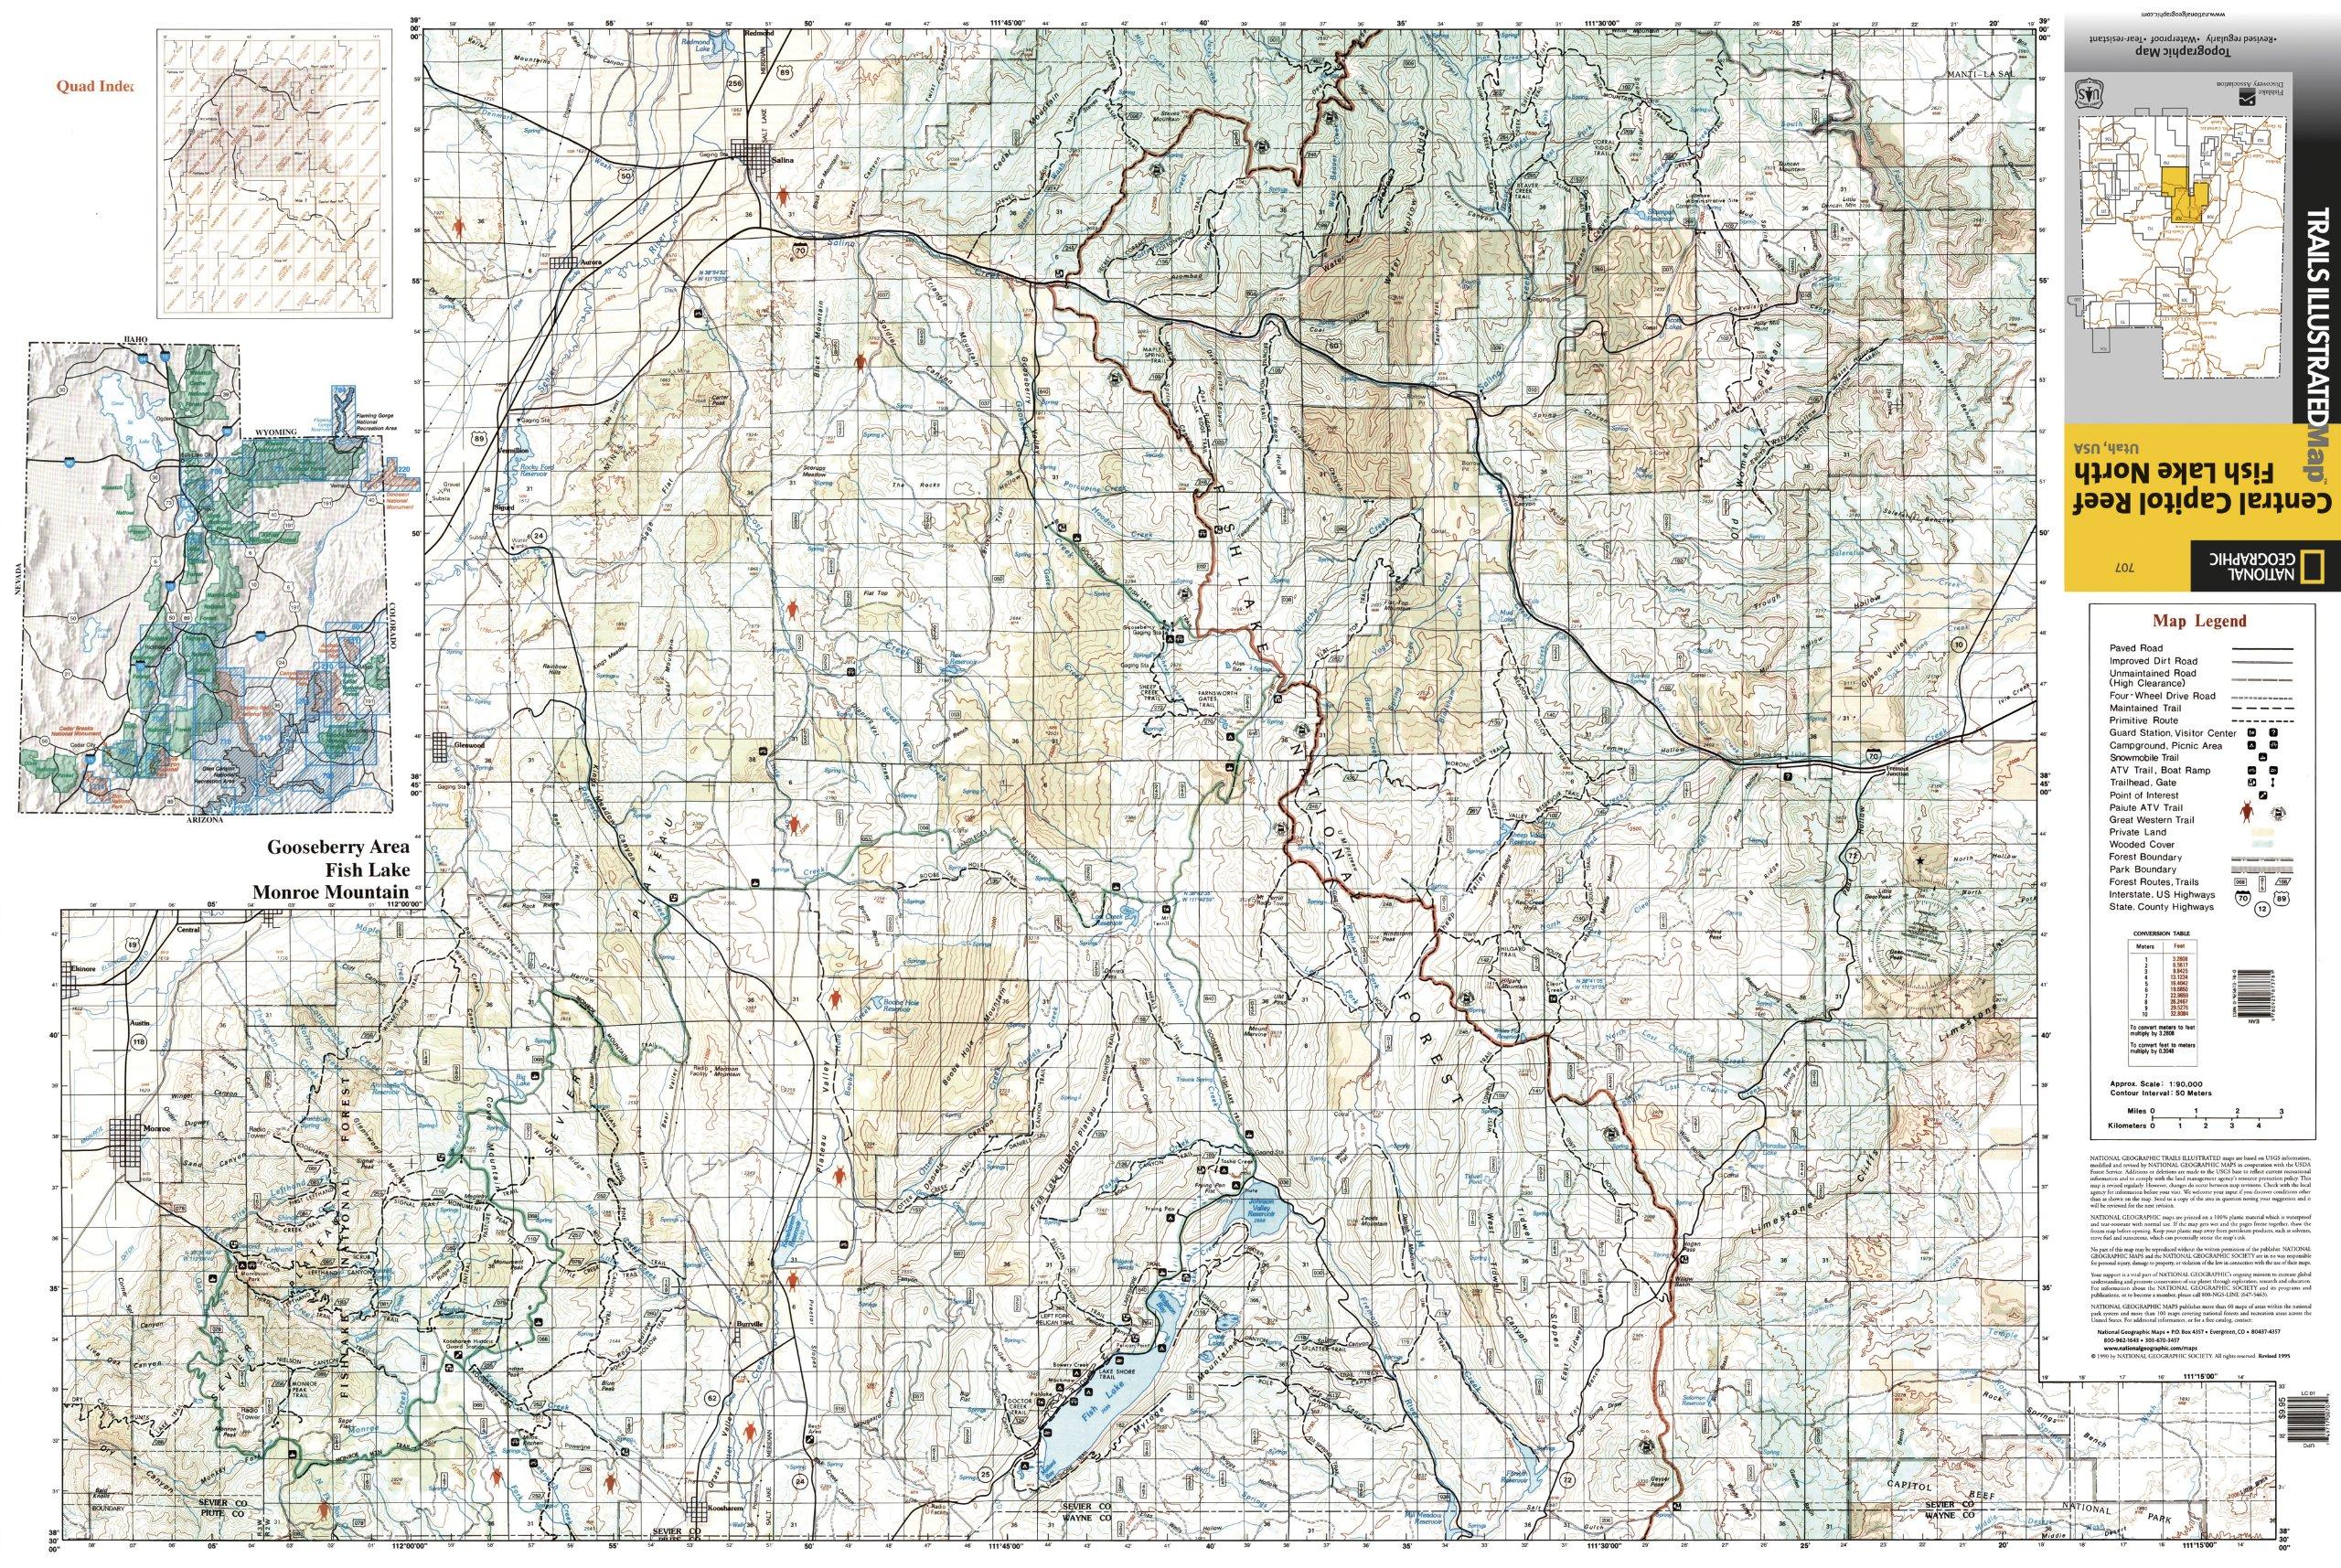 Central Capitol Reef & Fish Lake North Utah Trail Map National